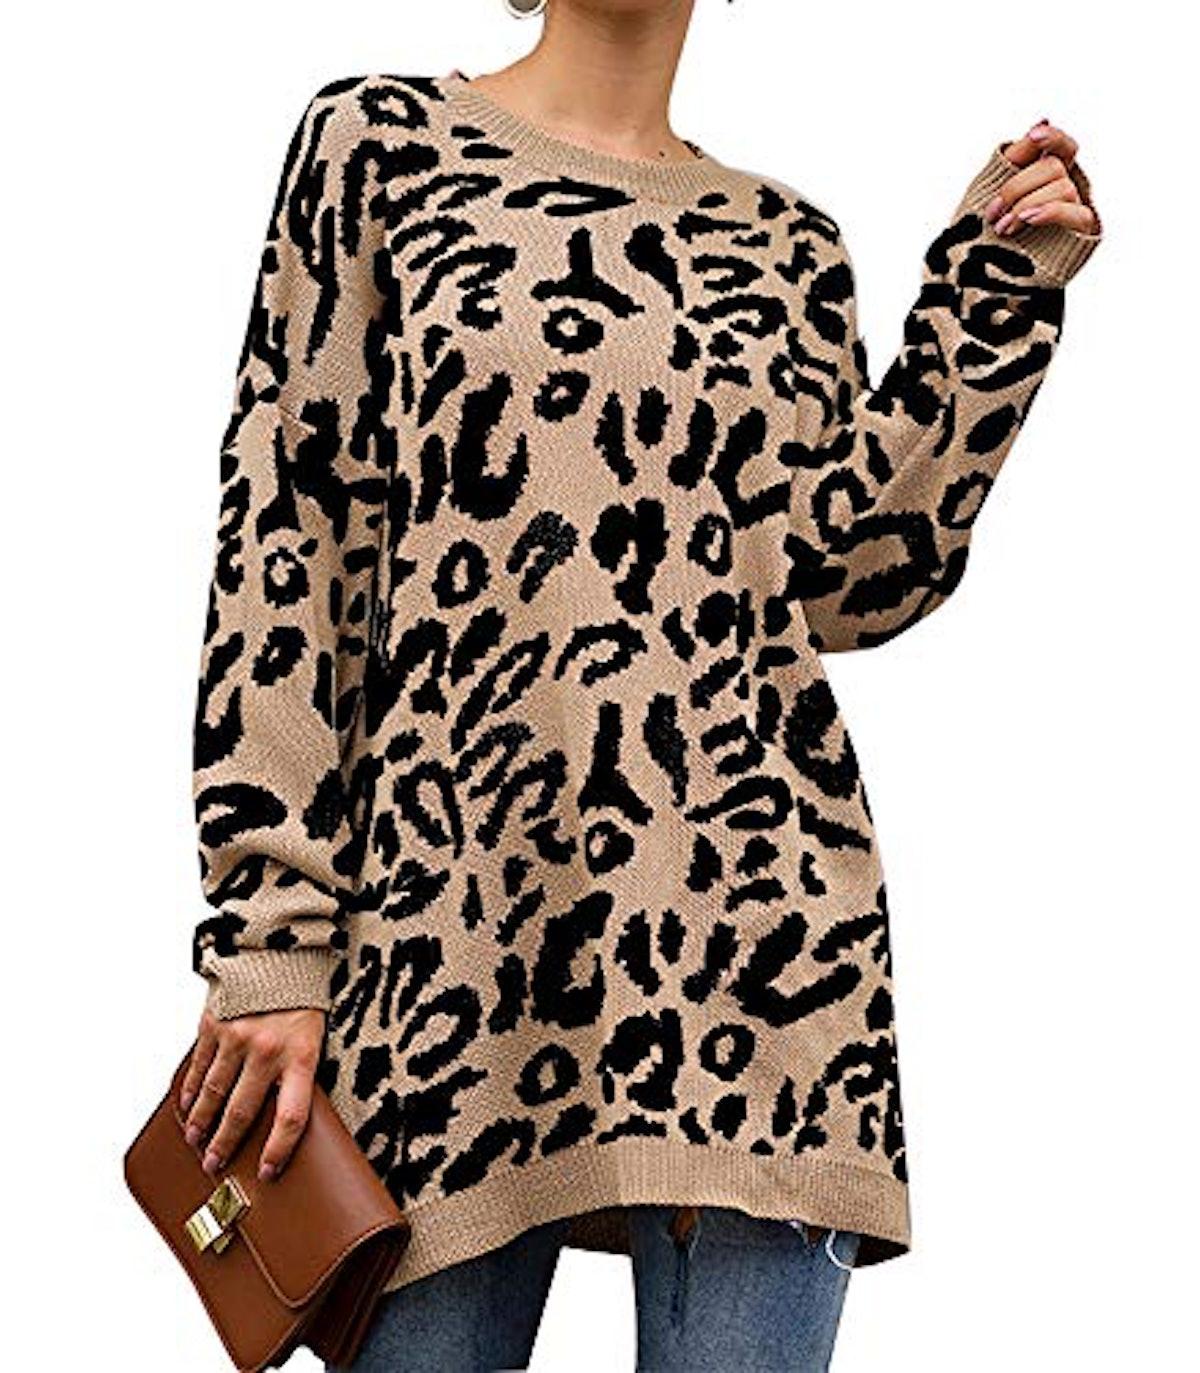 PRETTYGARDEN Leopard Print Oversized Crewneck Sweater